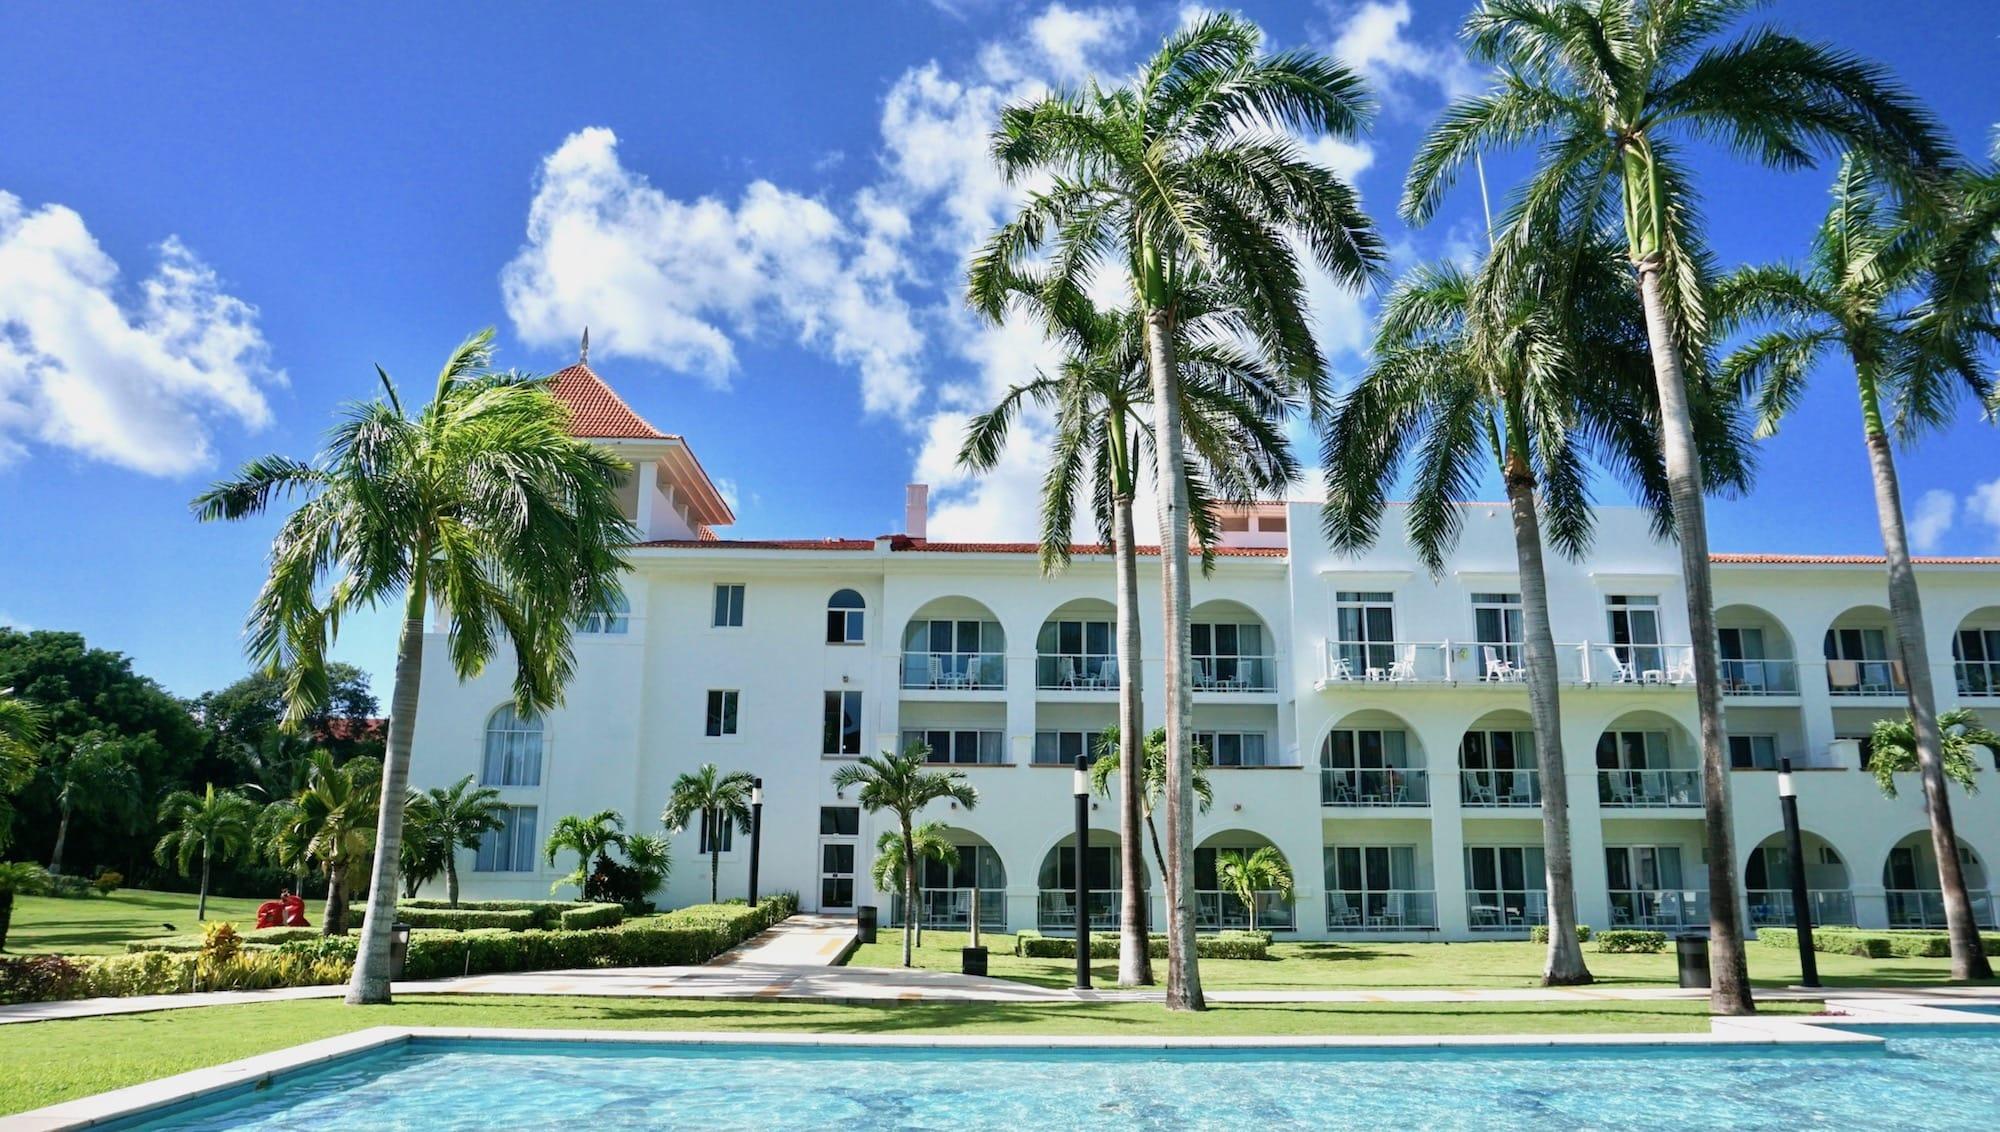 hotel riu palace playacar